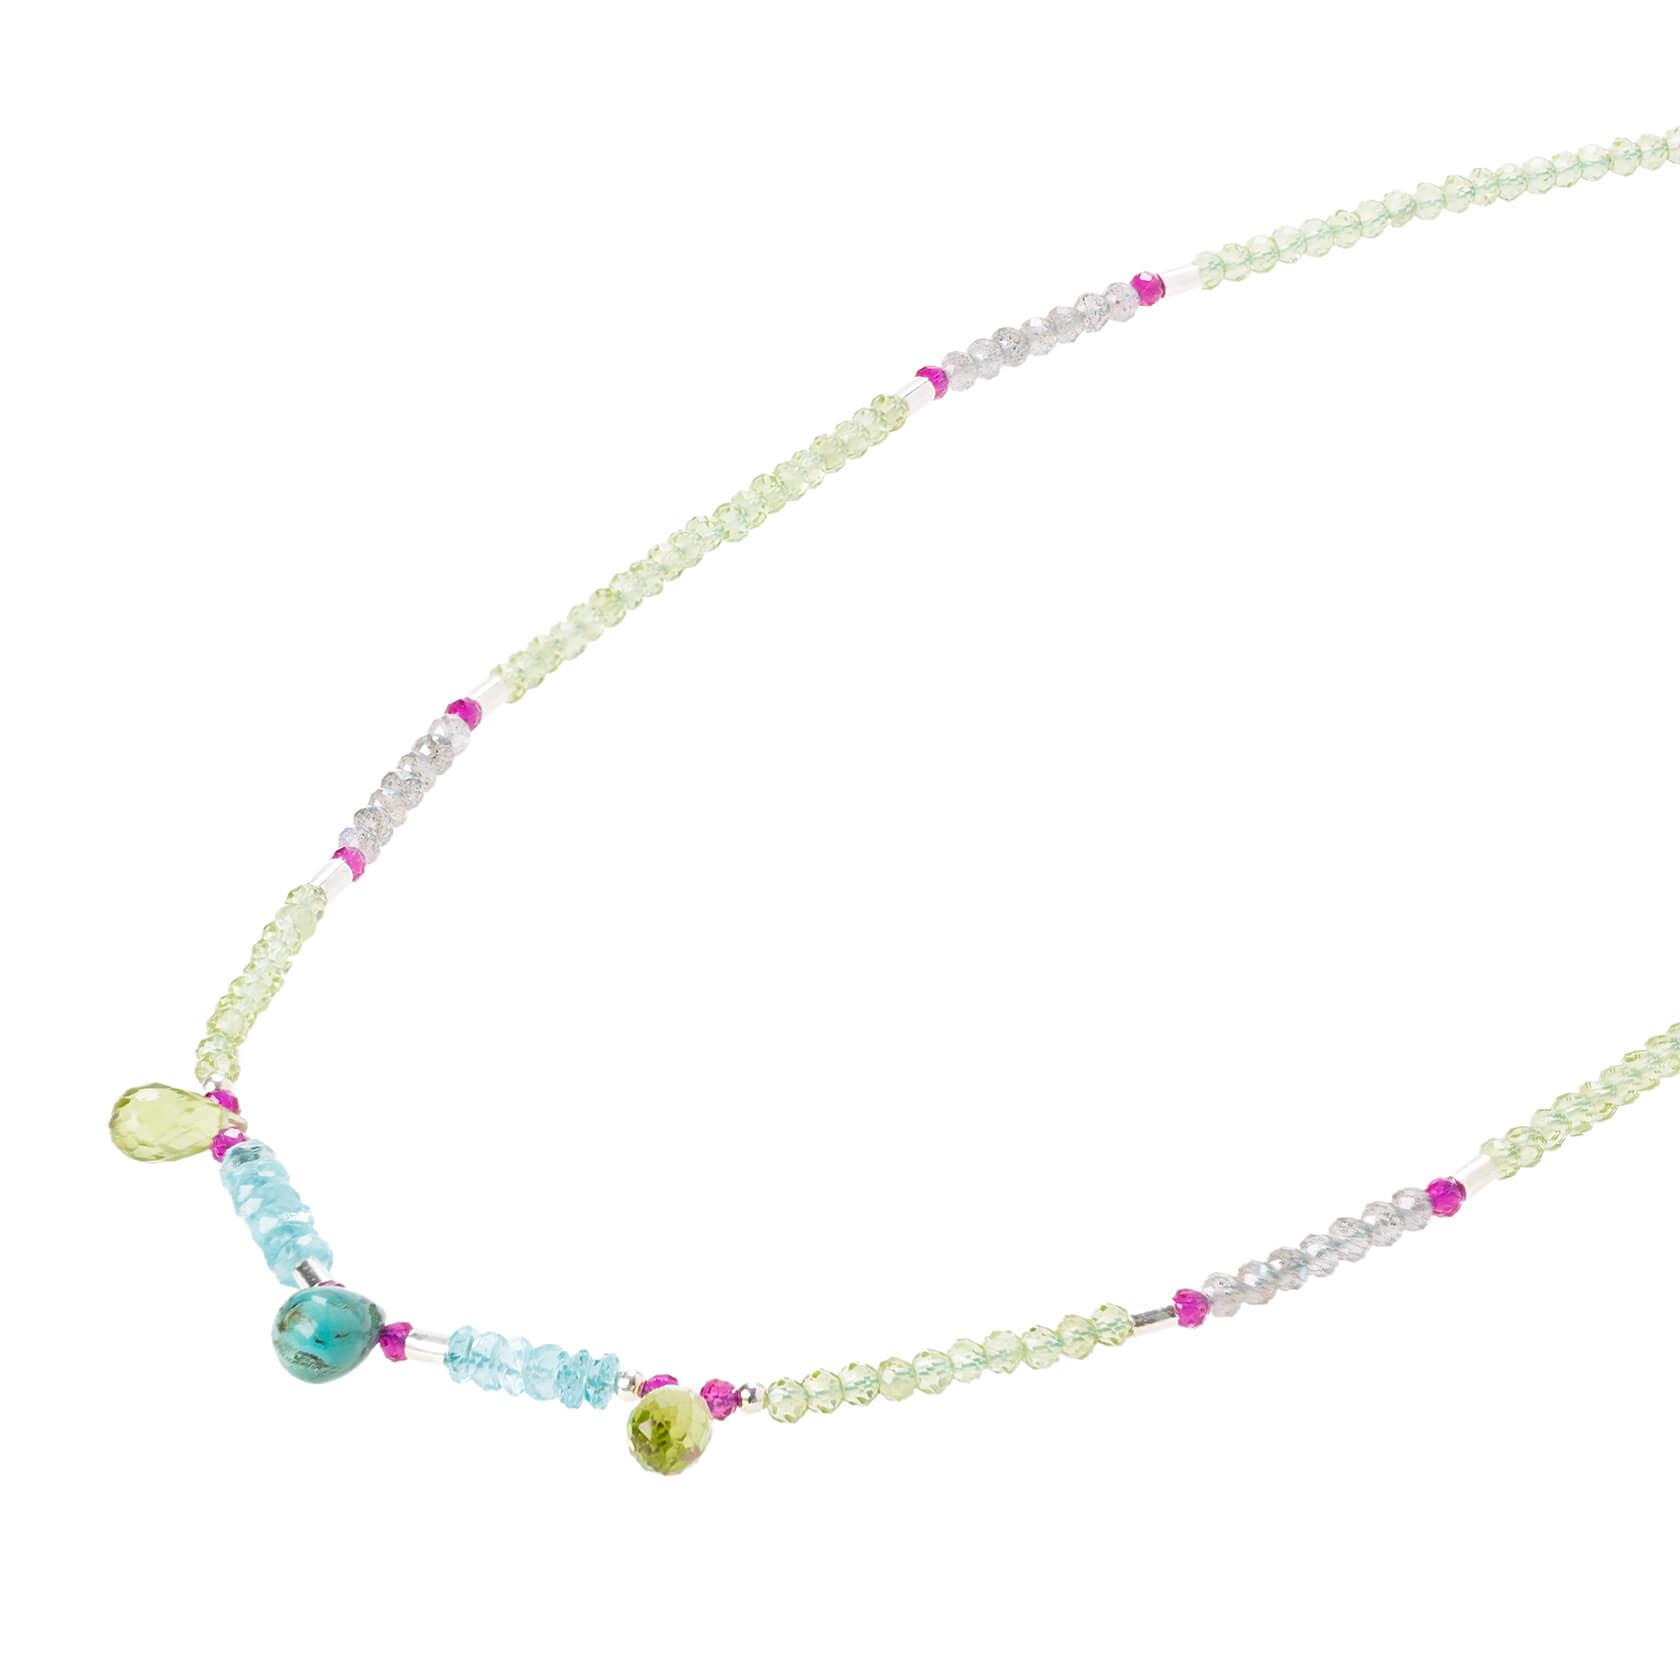 Karashi peridot short necklace